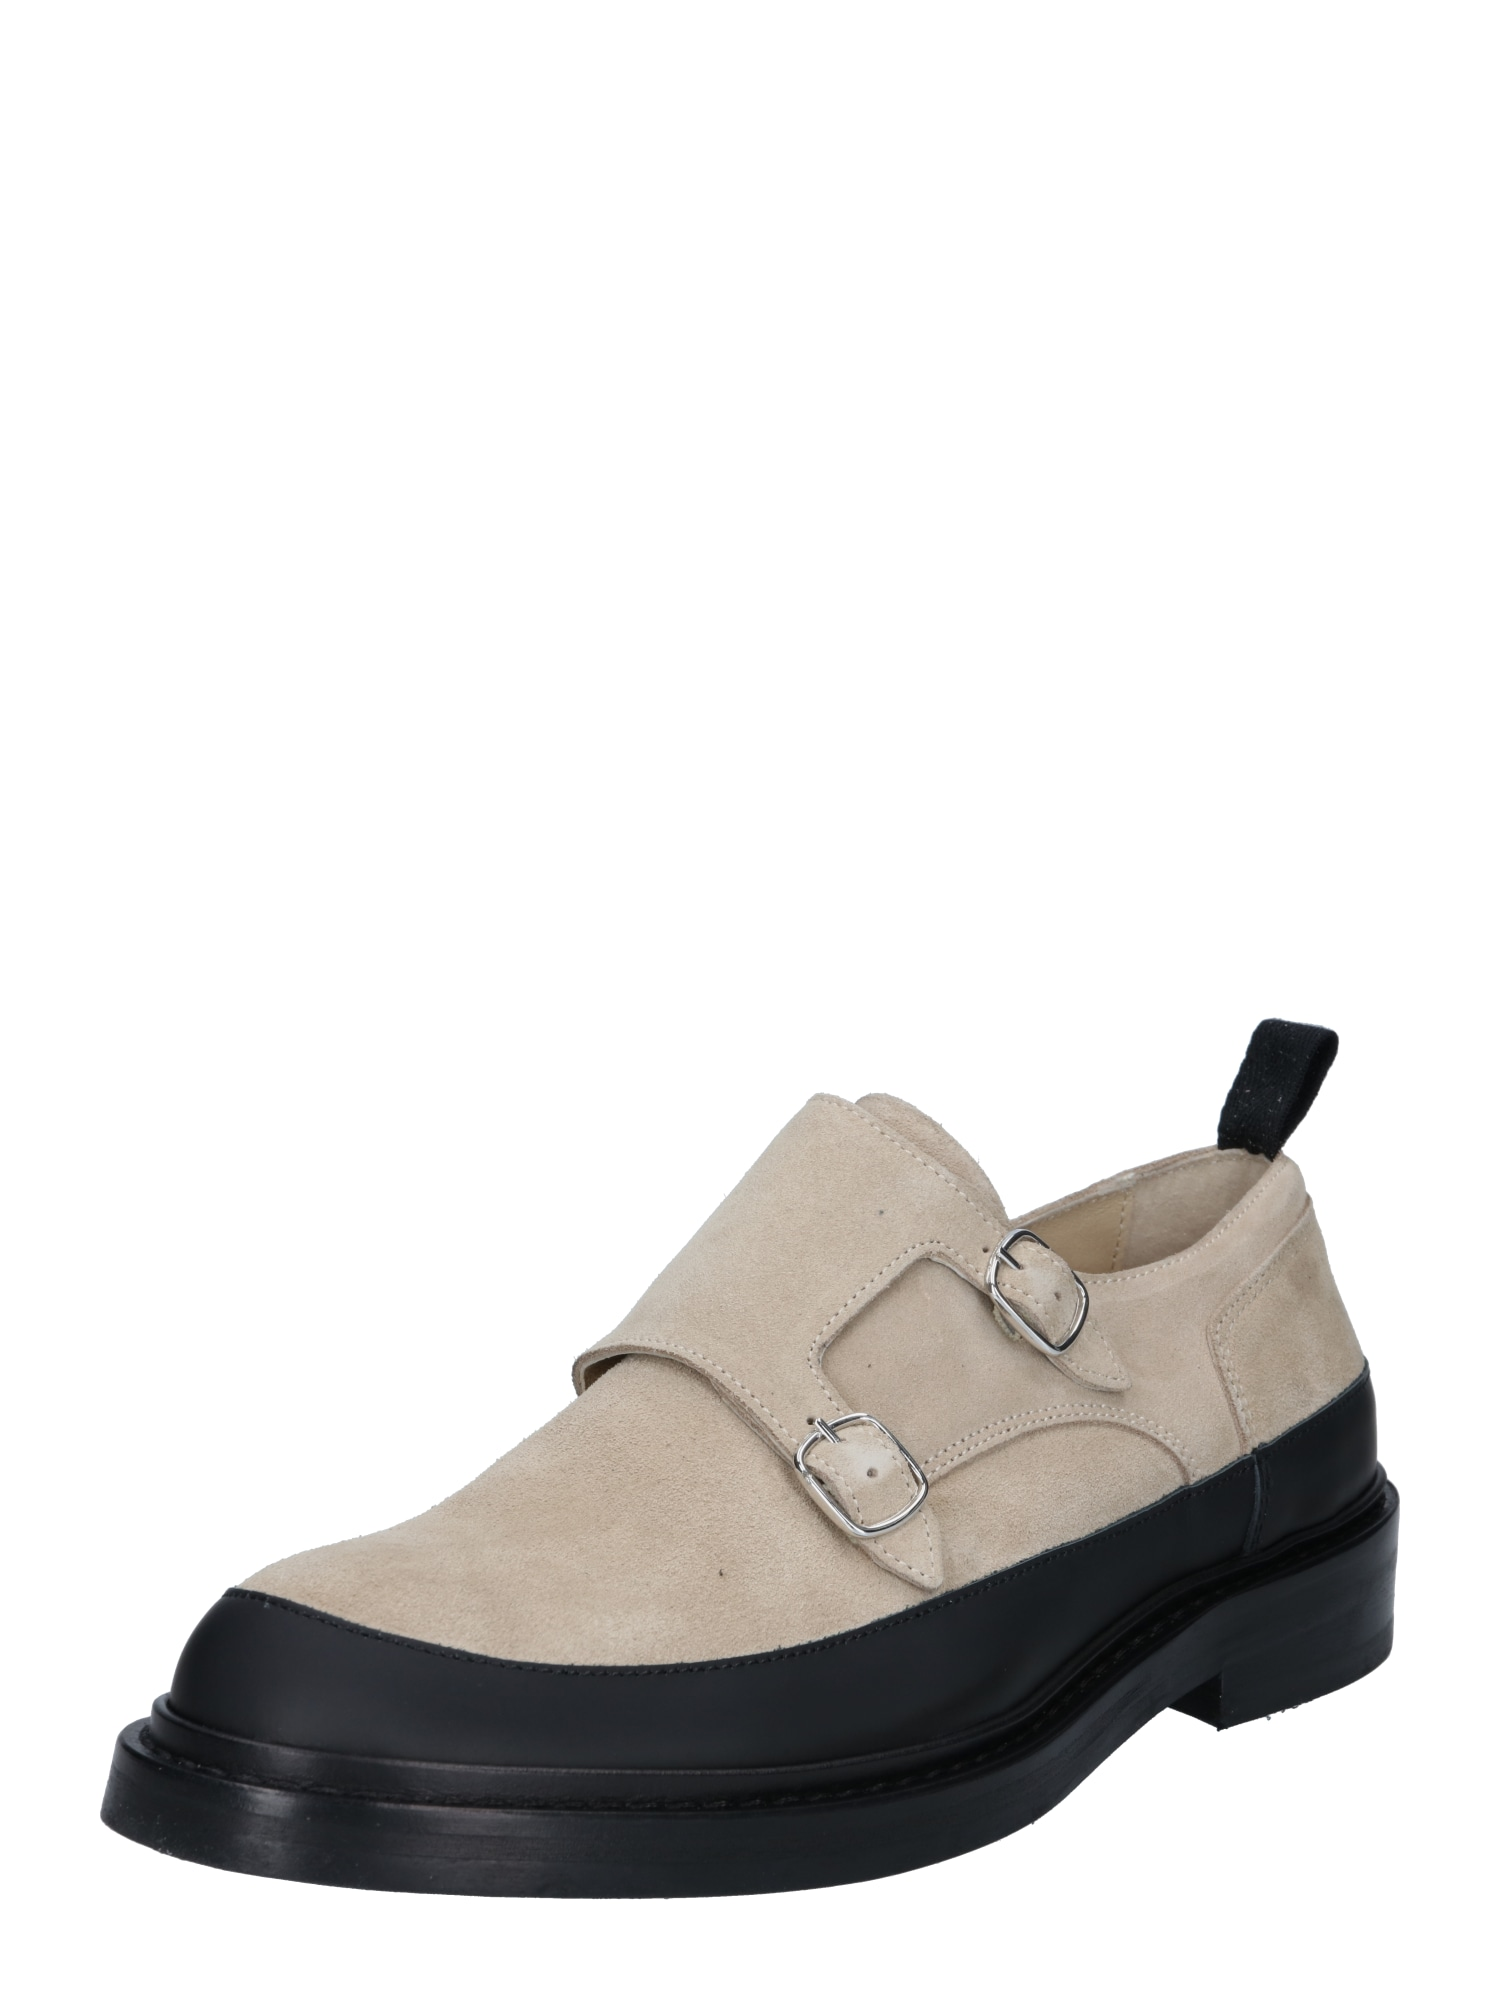 SELECTED HOMME Dalykiniai batai